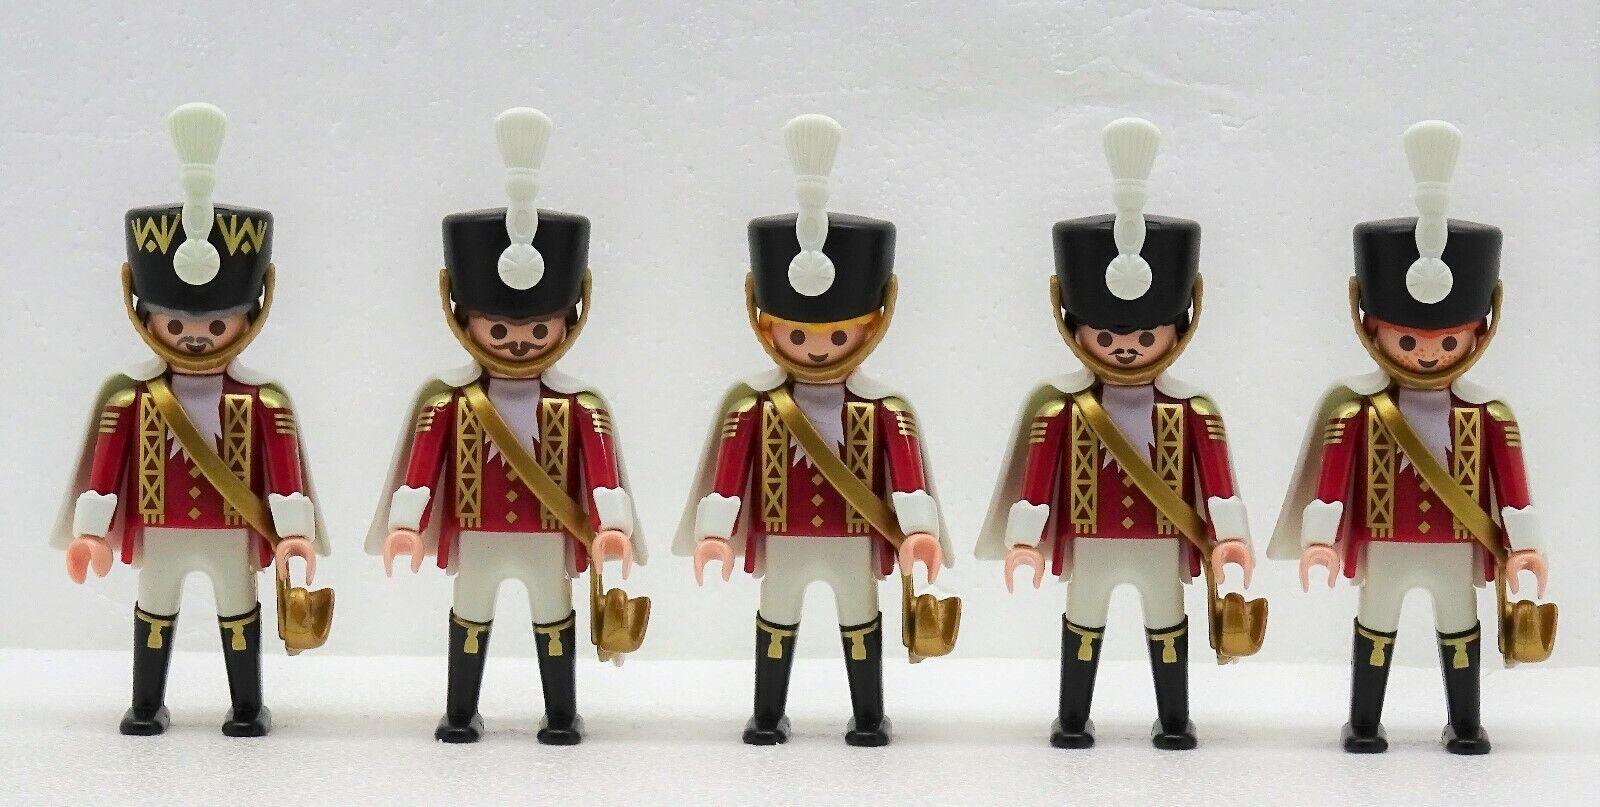 5 x GARDE HUSAR SOLDAT Playmobil zu Rotröcke Dragoner Umhang Stiefel Rot Gold